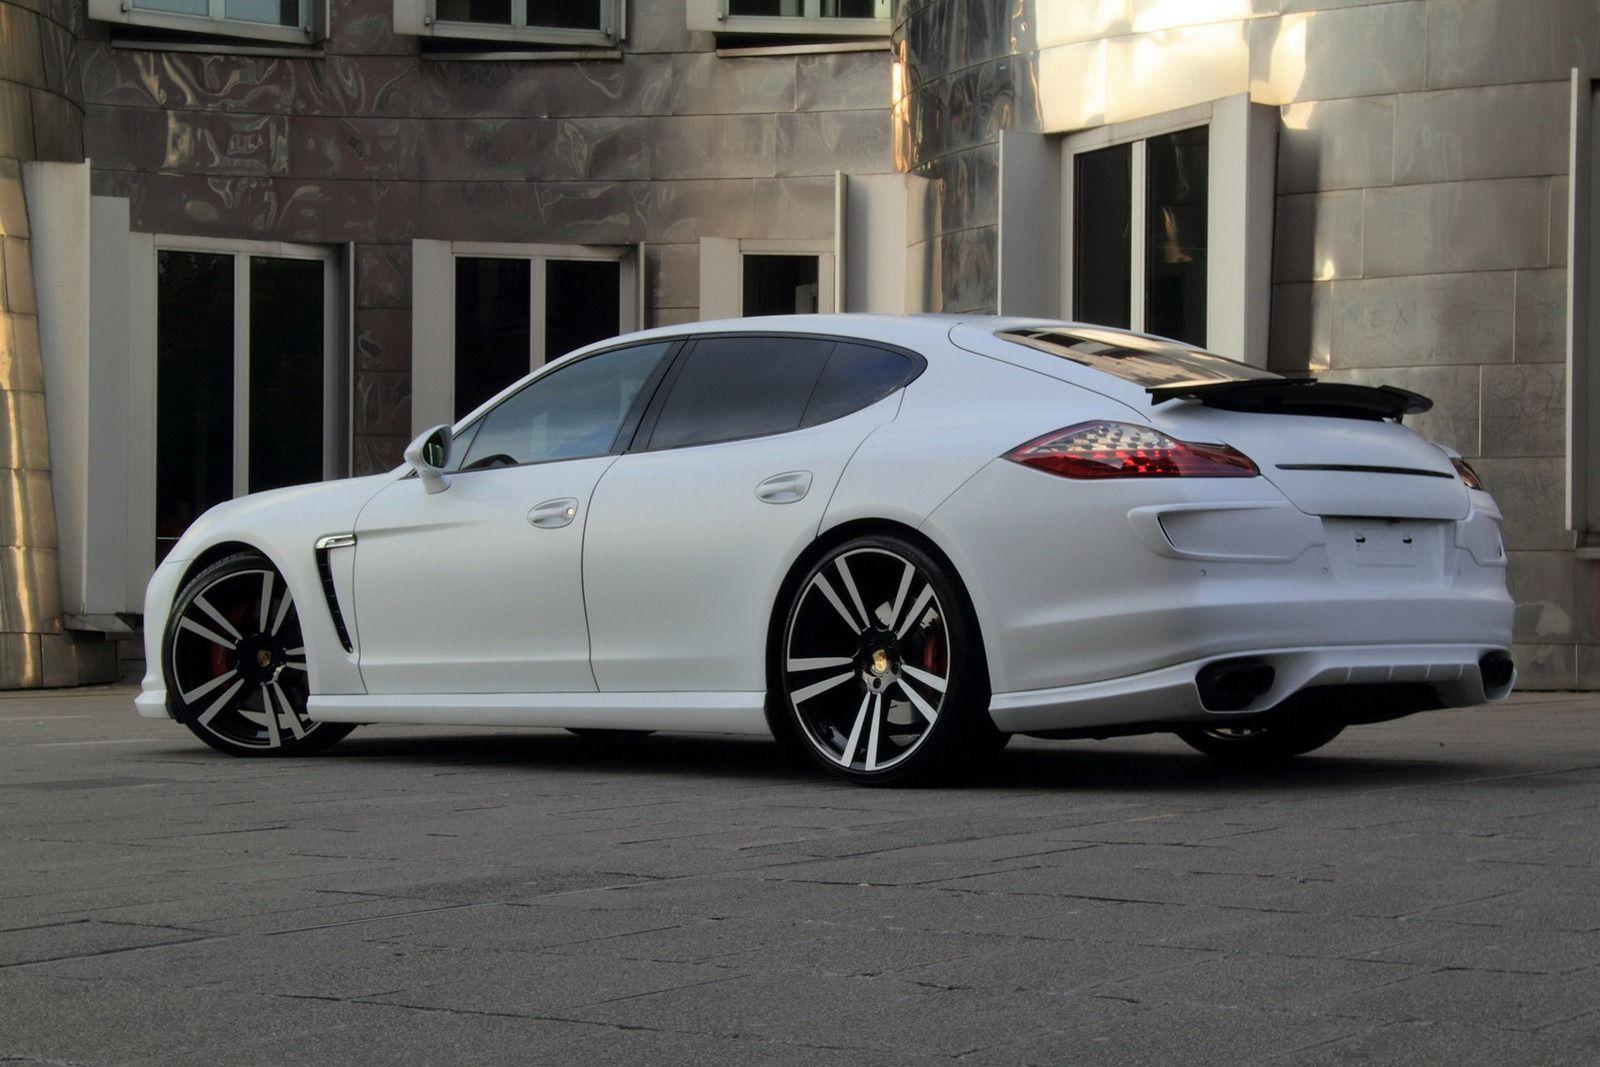 Panamera GTS Turbo Porsche panamera, Porsche panamera